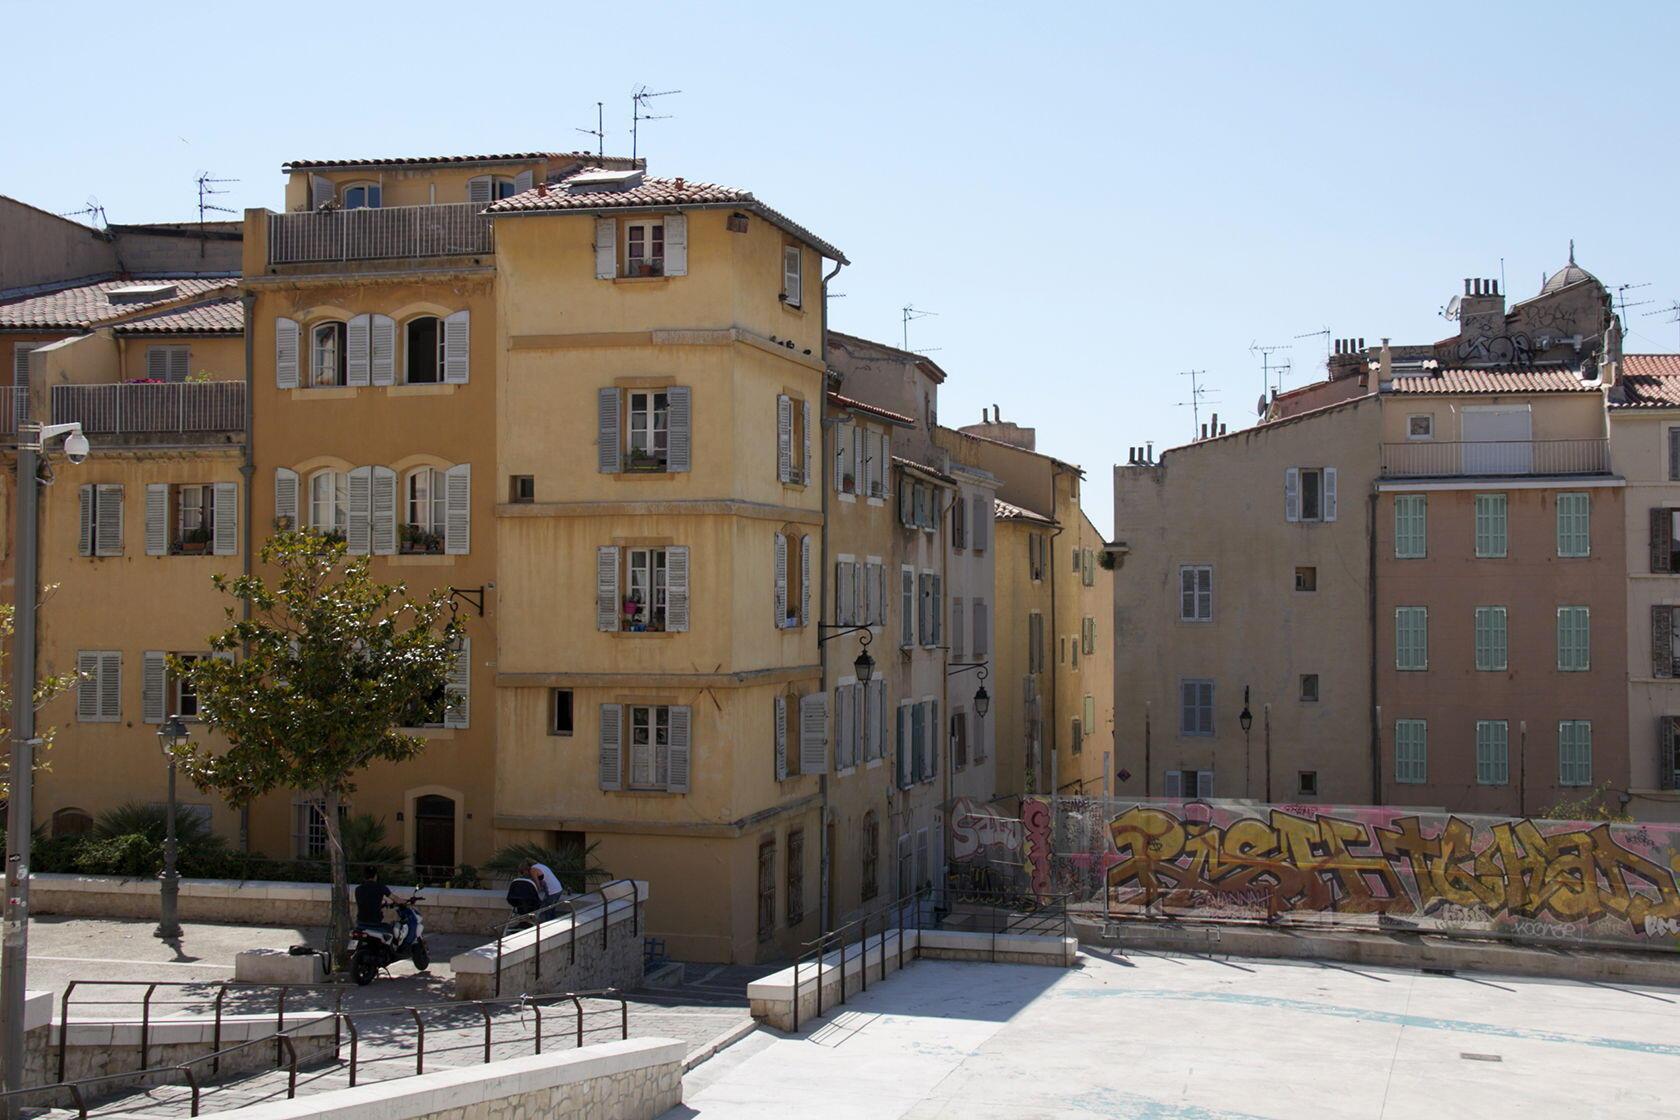 Marseille Le Panier Reasons to Visit